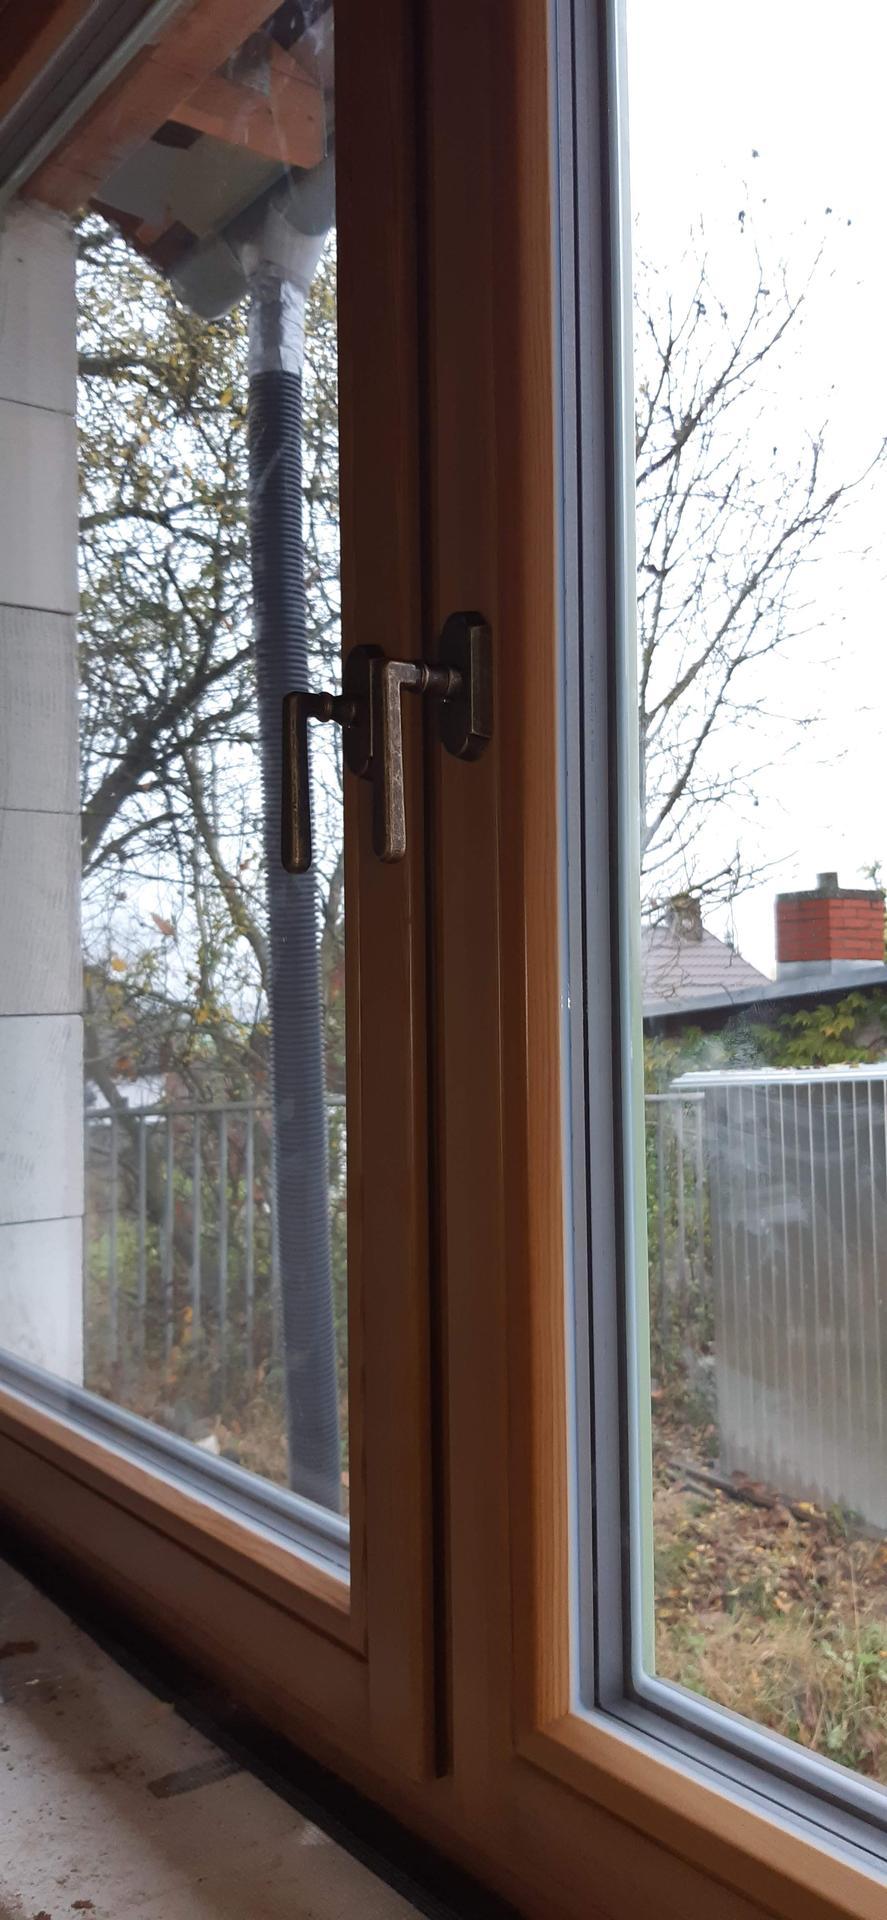 Okna a dveře - Obrázek č. 2